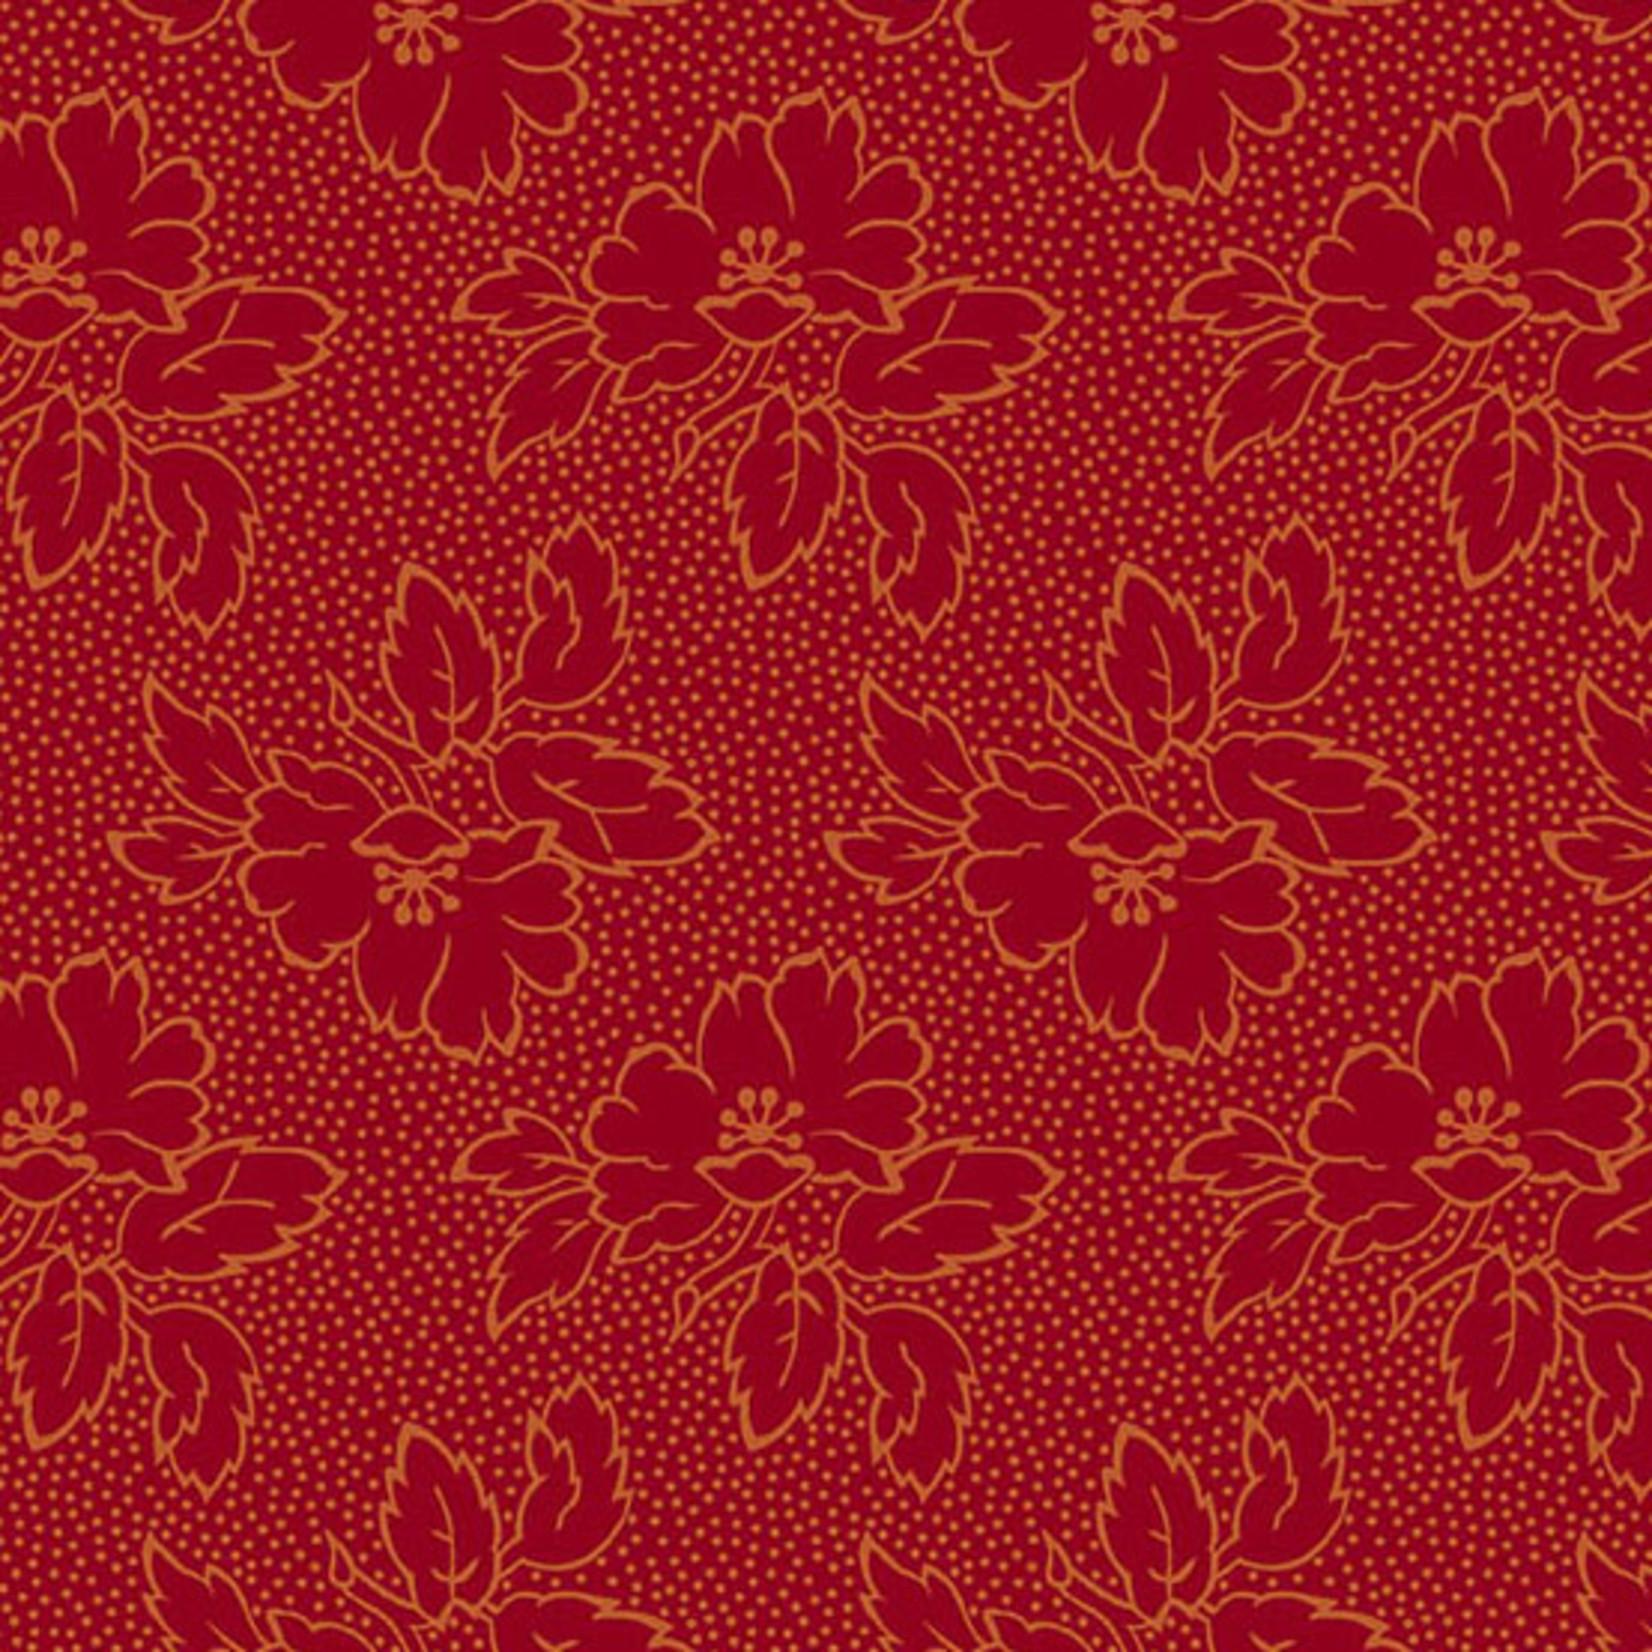 Edyta Sitar Secret Stash - Warms, Silhouette Floral, Red (8752-R) $0.20 per cm or $20/m